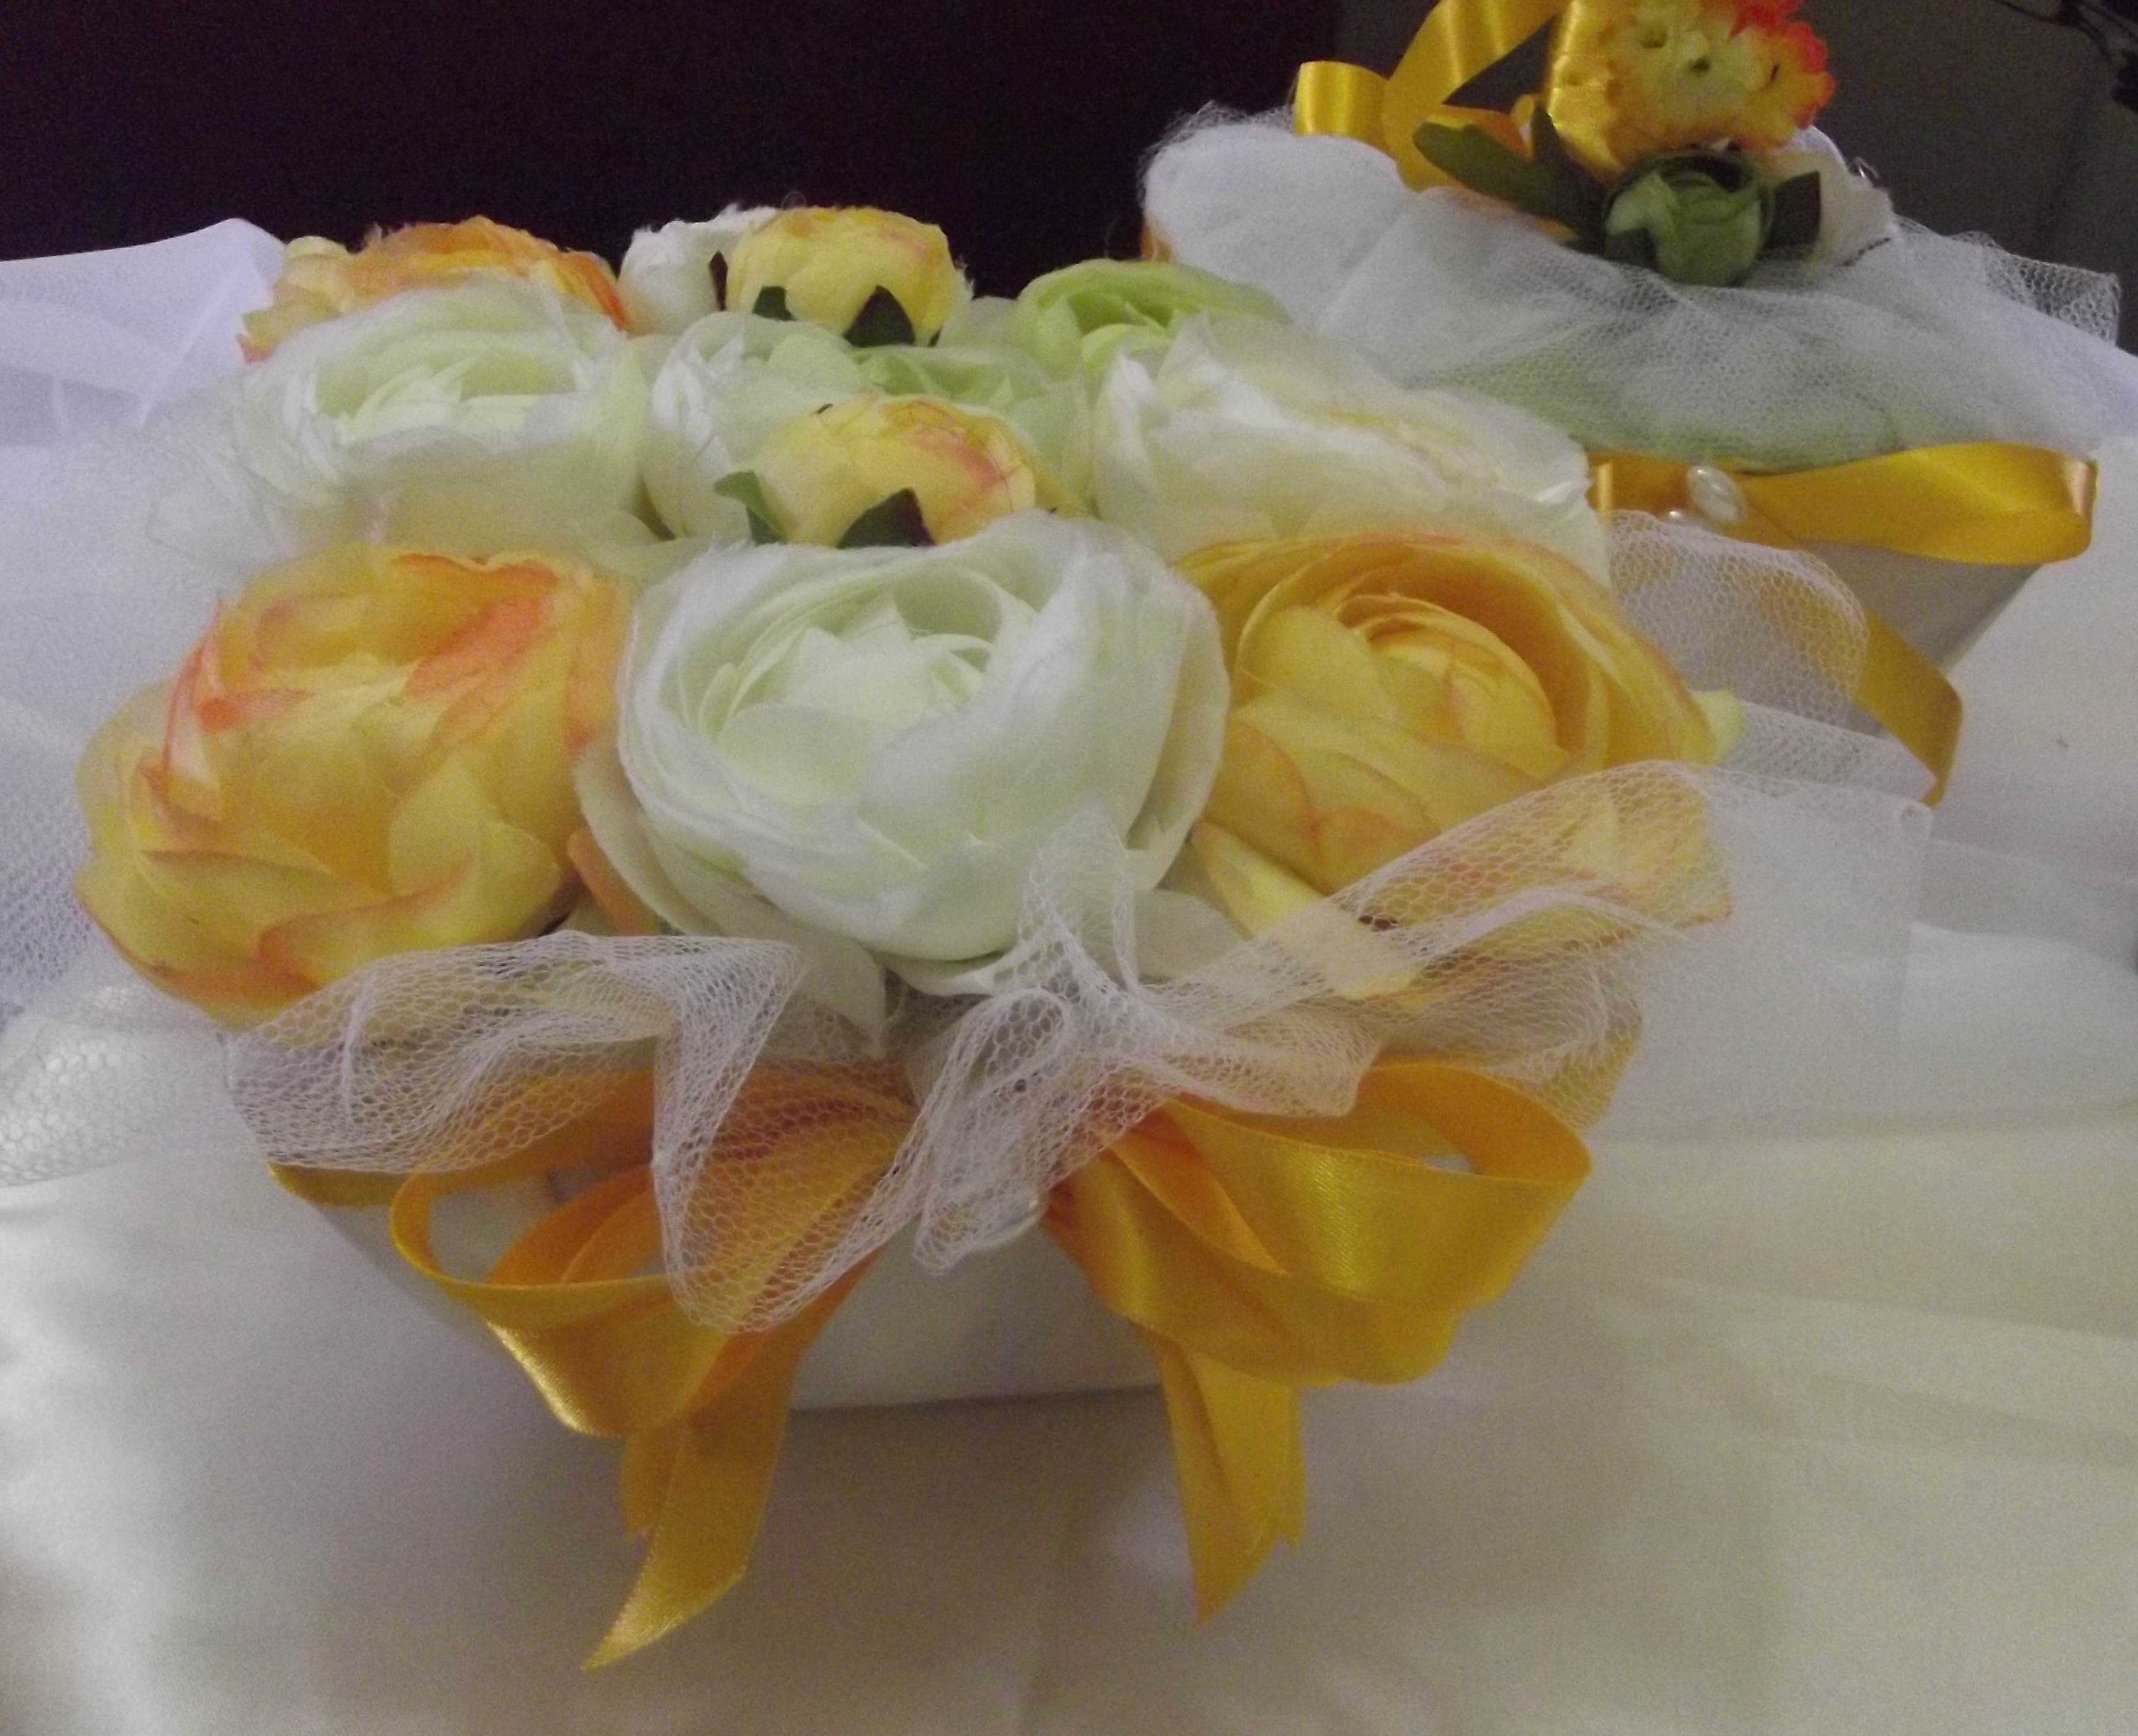 kit decoracao casamento : kit decoracao casamento:casamento Kit decoração casamento Kit decoração casamento Kit